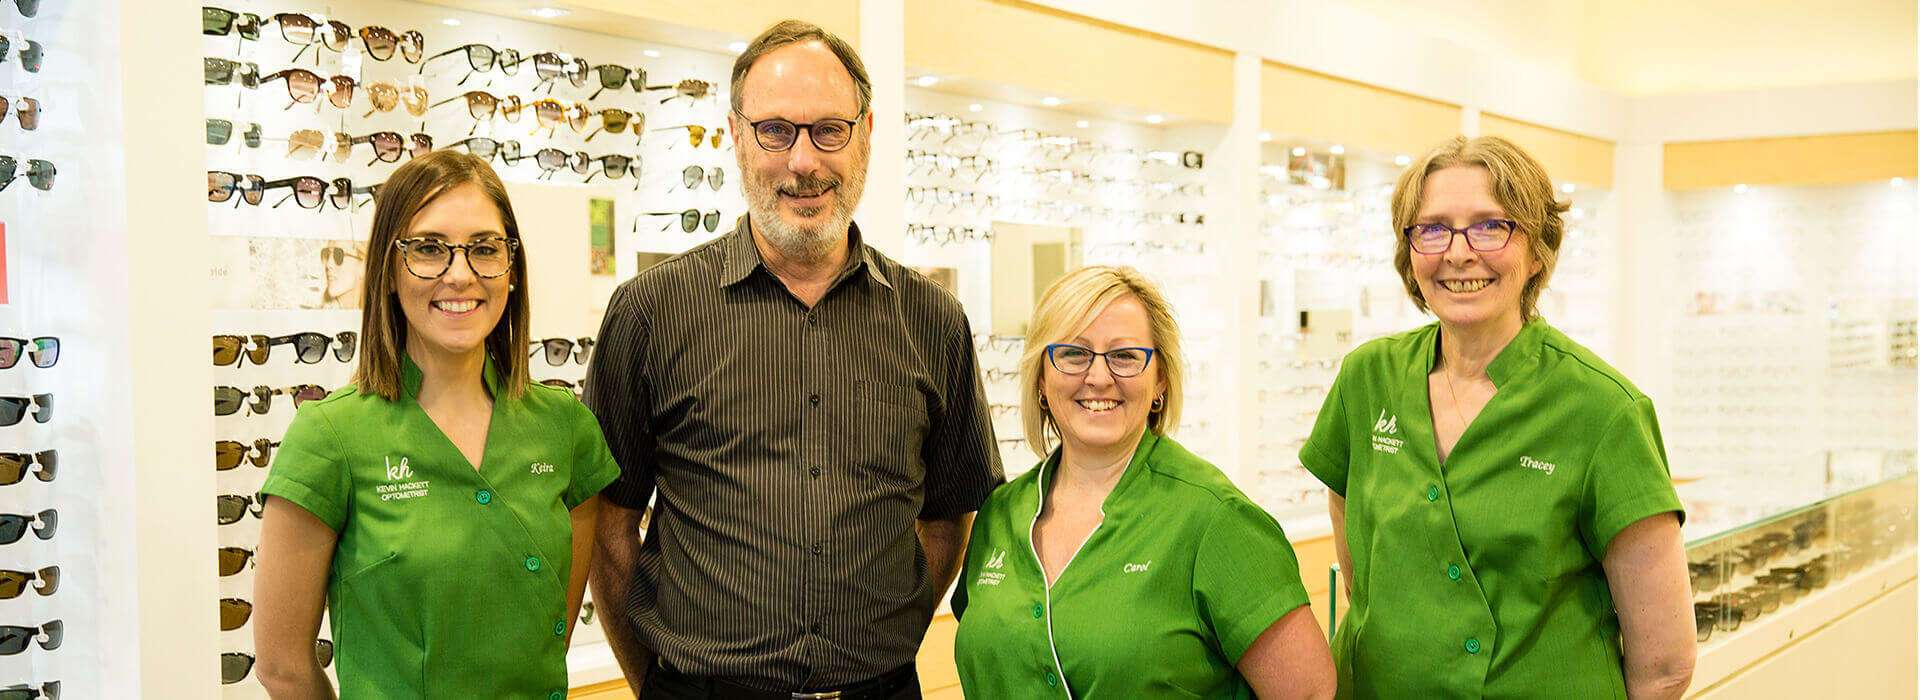 Kevin Hackett Optometrist